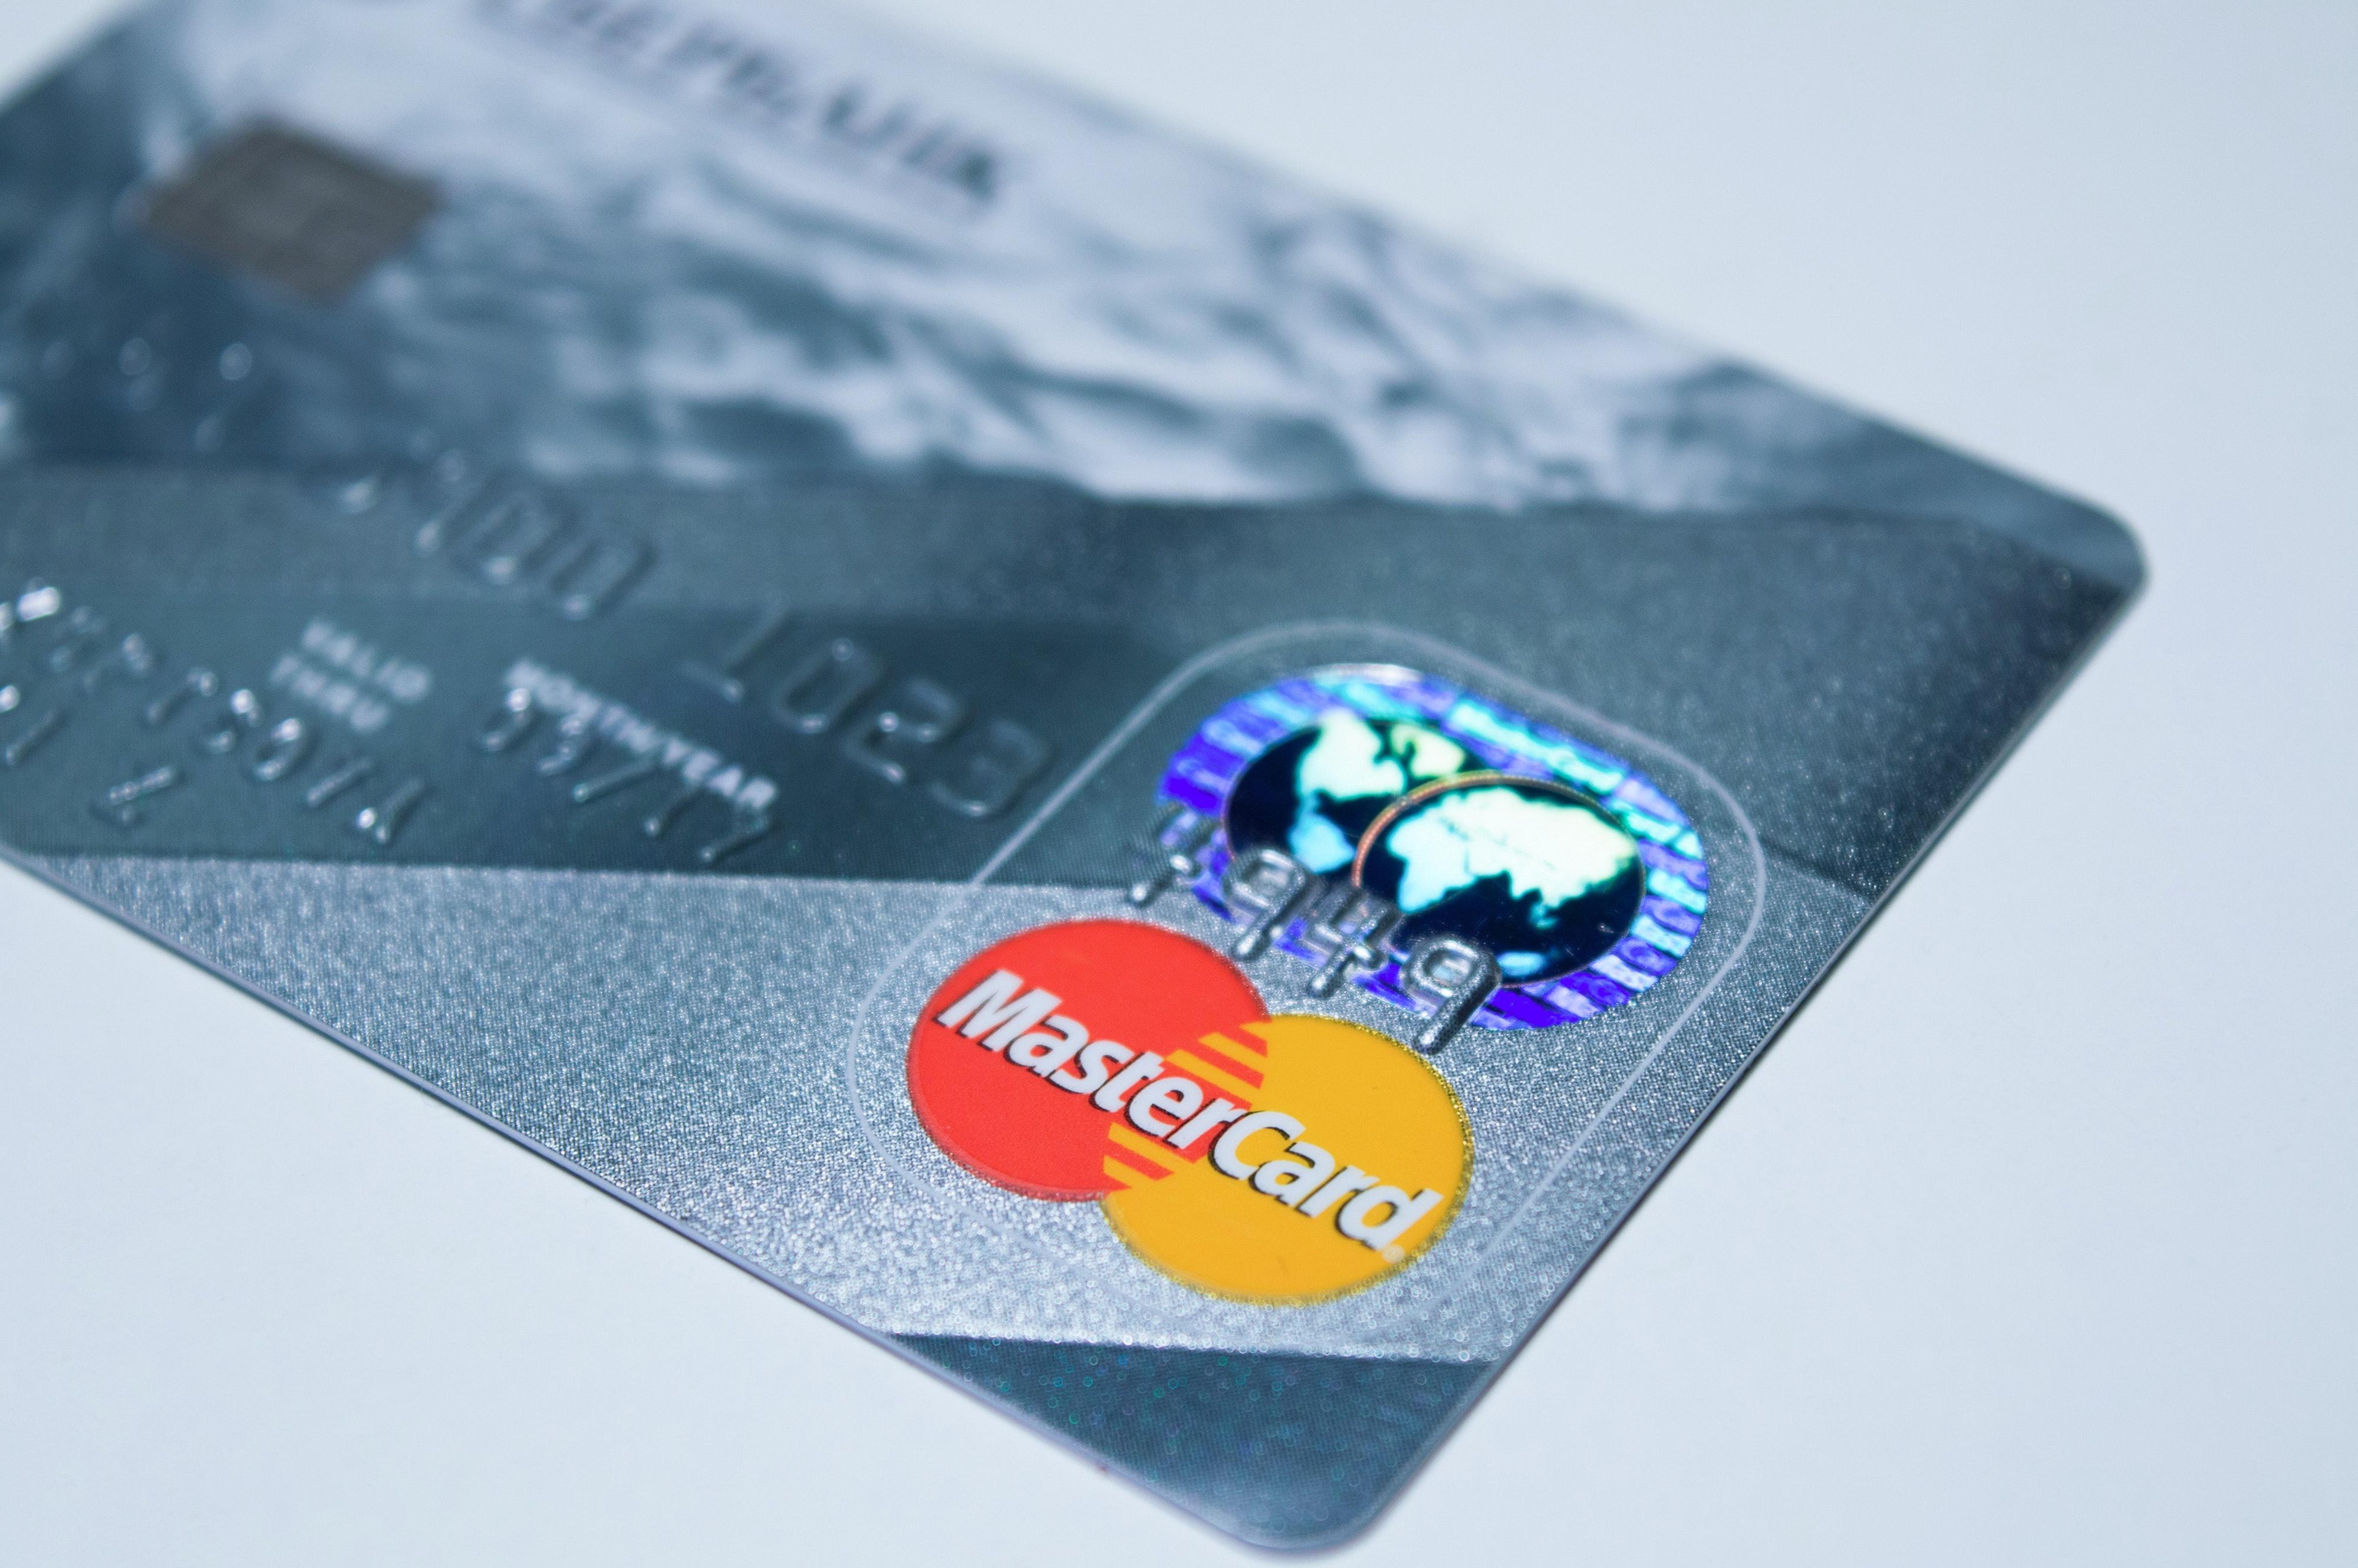 Master Card Debit Card · Free Stock Photo